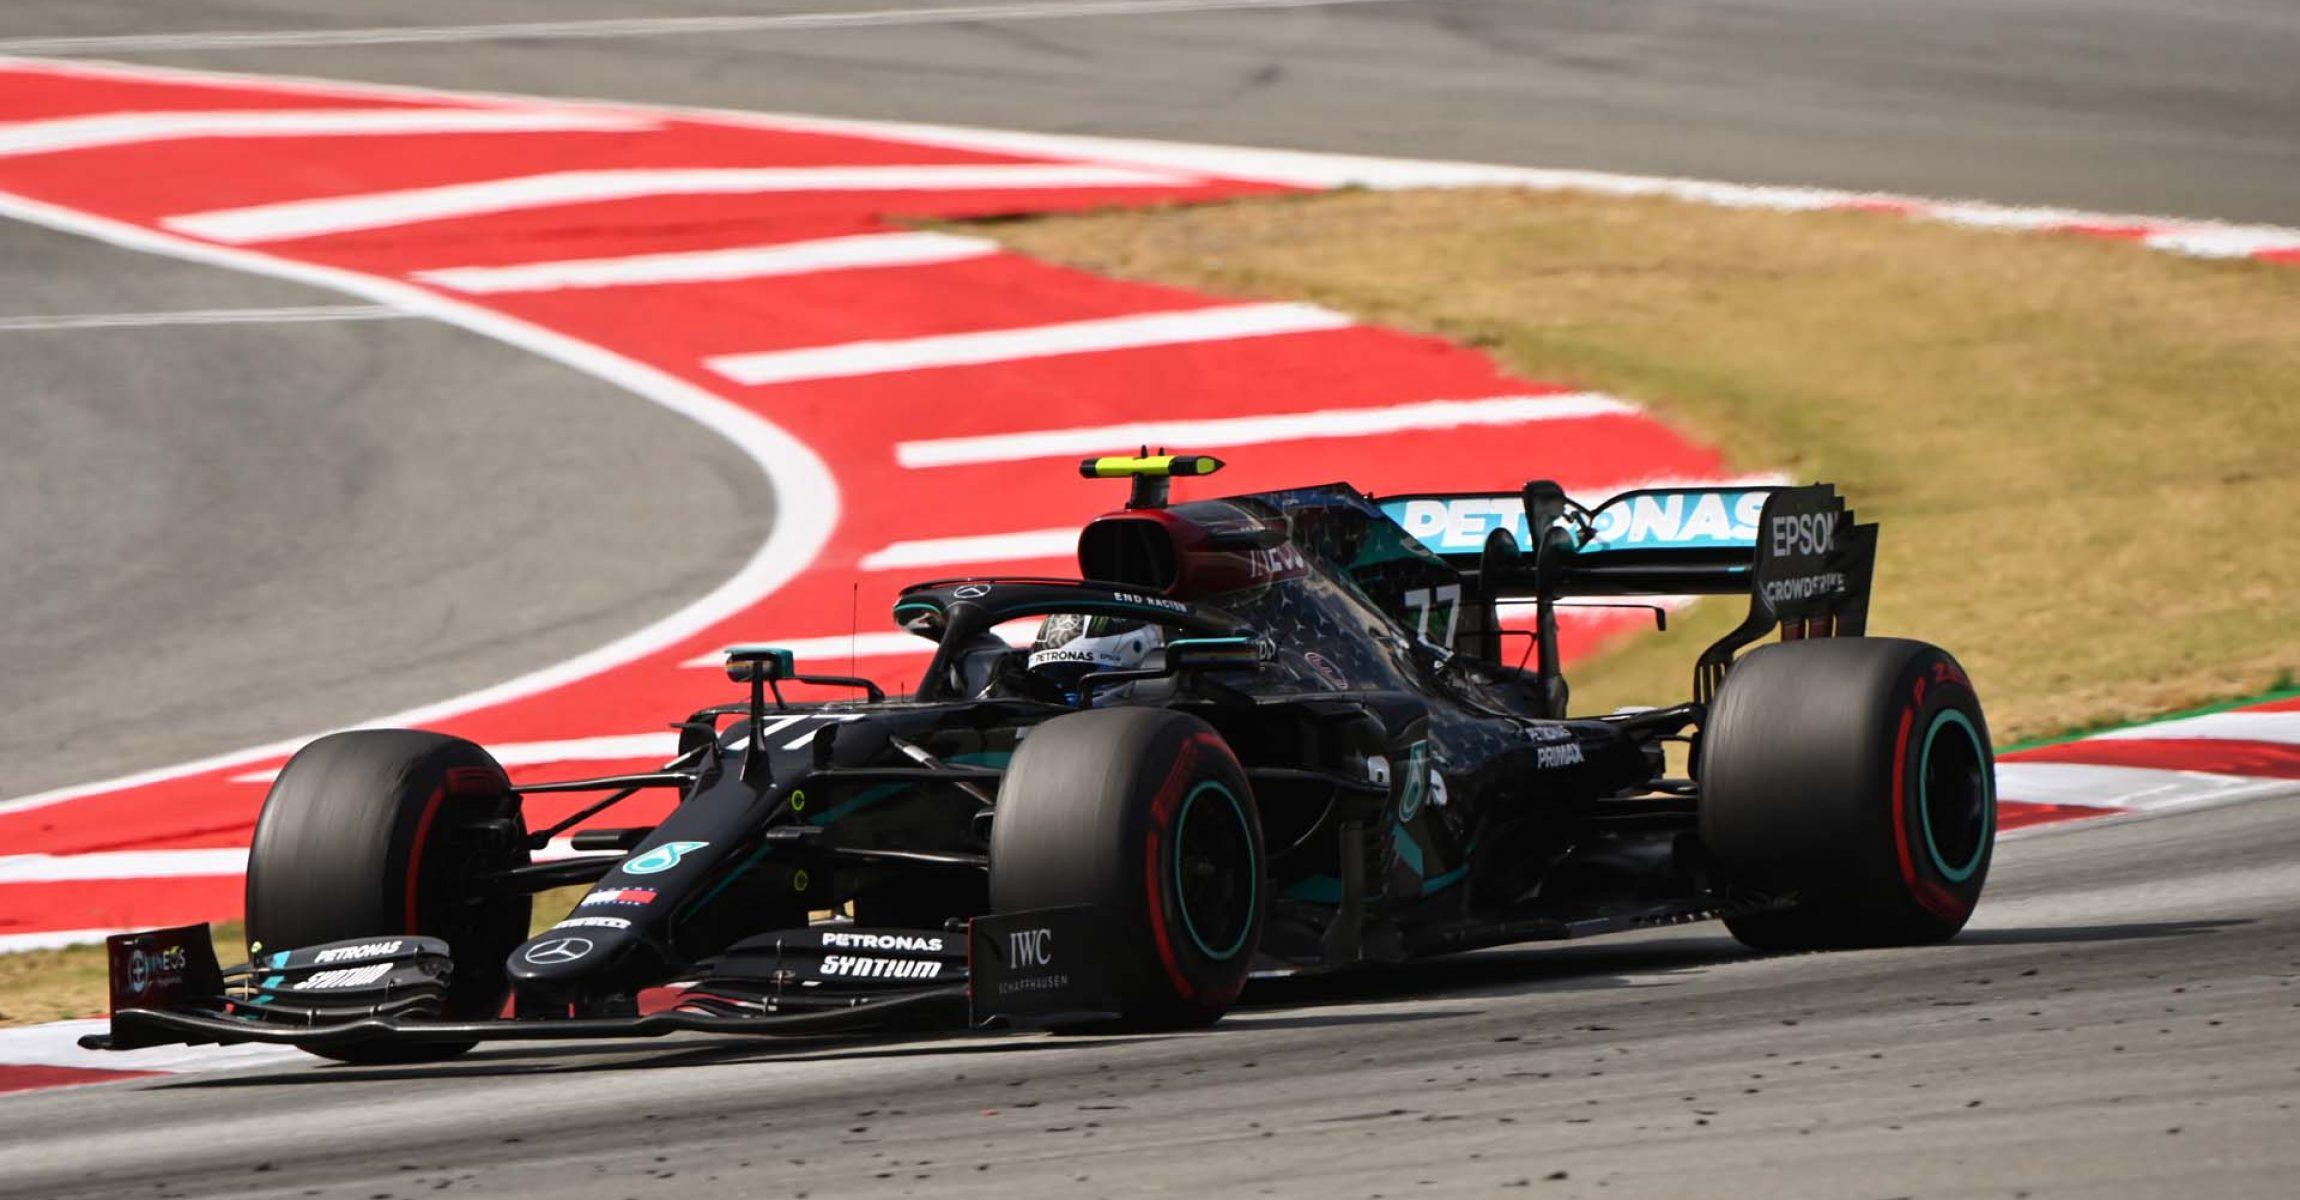 2020 Spanish Grand Prix, Sunday - LAT Images Valtteri Bottas Mercedes